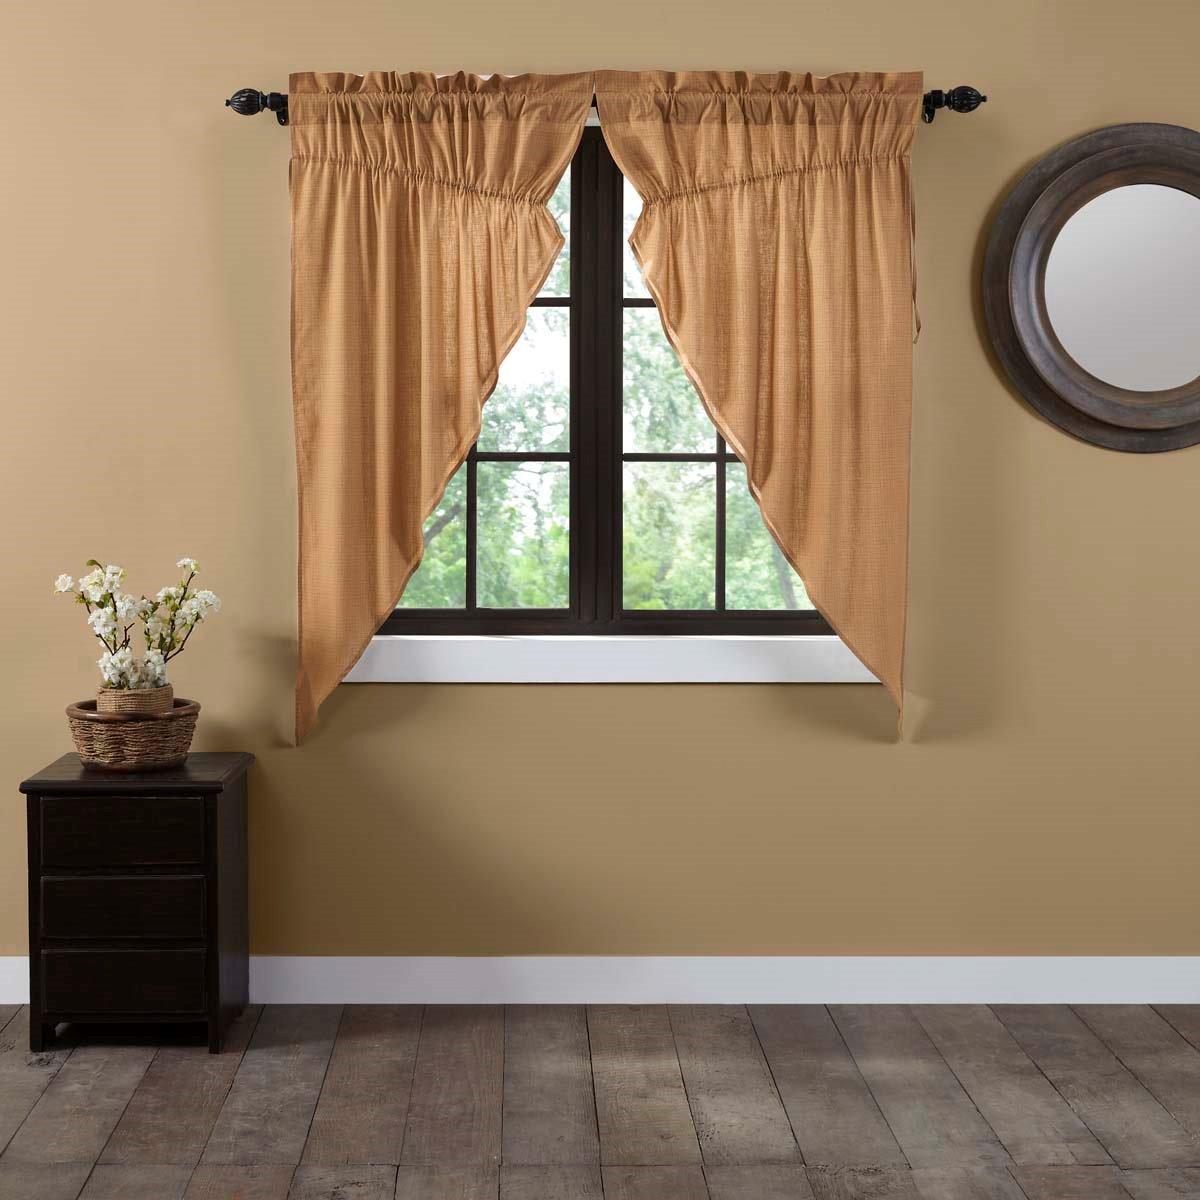 Kindred Star Plaid Prairie Curtain Set of 2 63x36x18